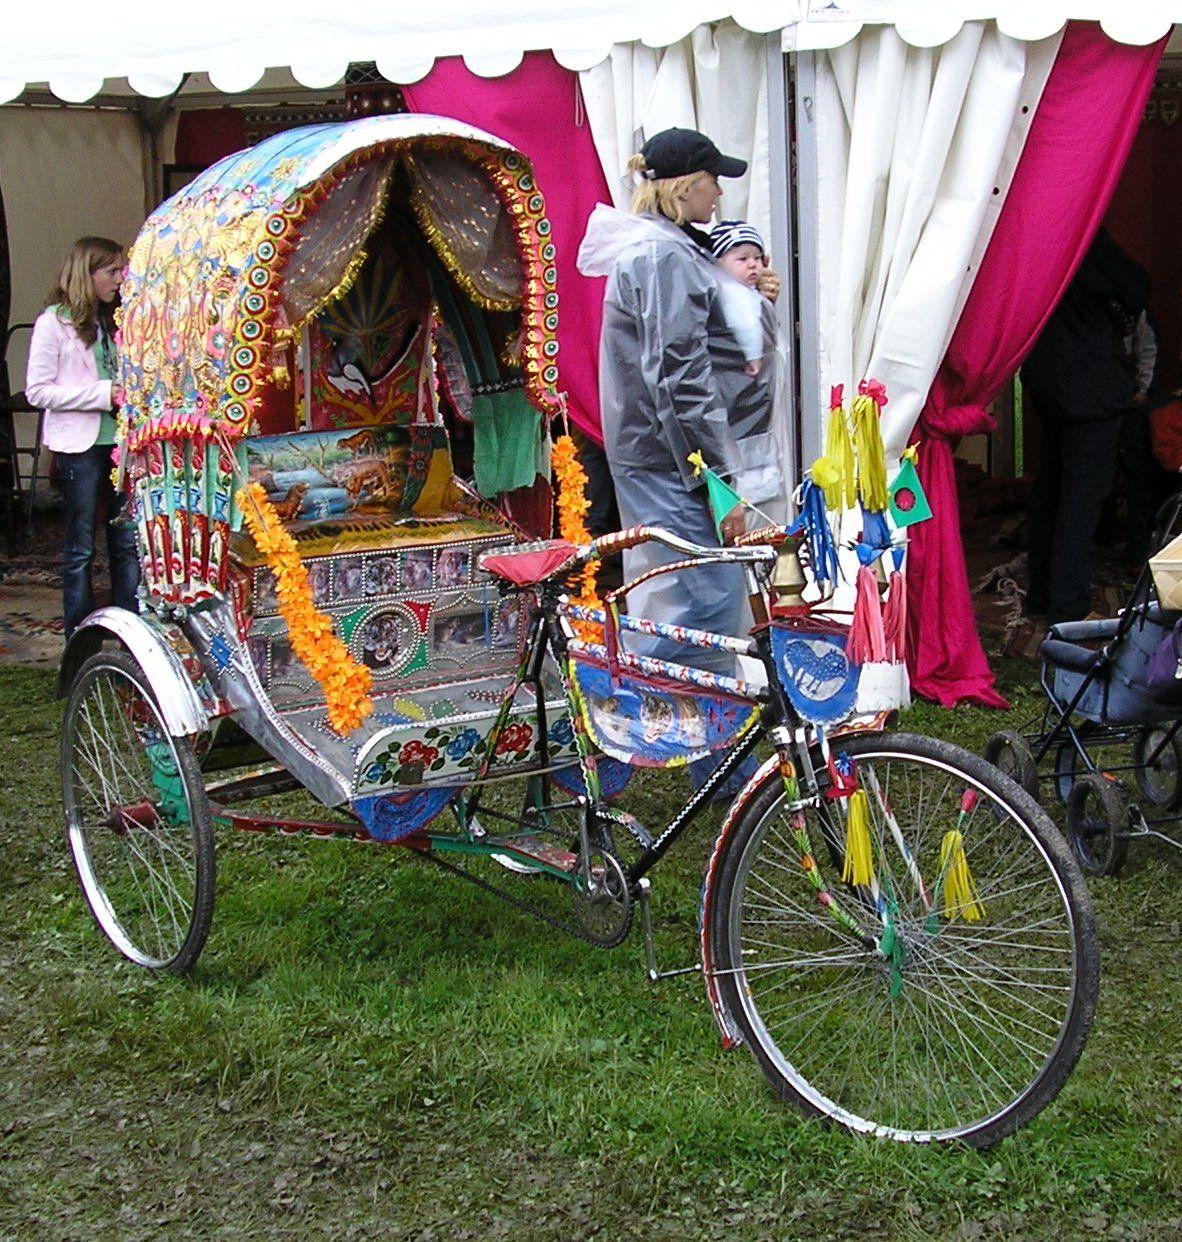 Cycle rickshaw Wikipedia, the free encyclopedia Retro bike